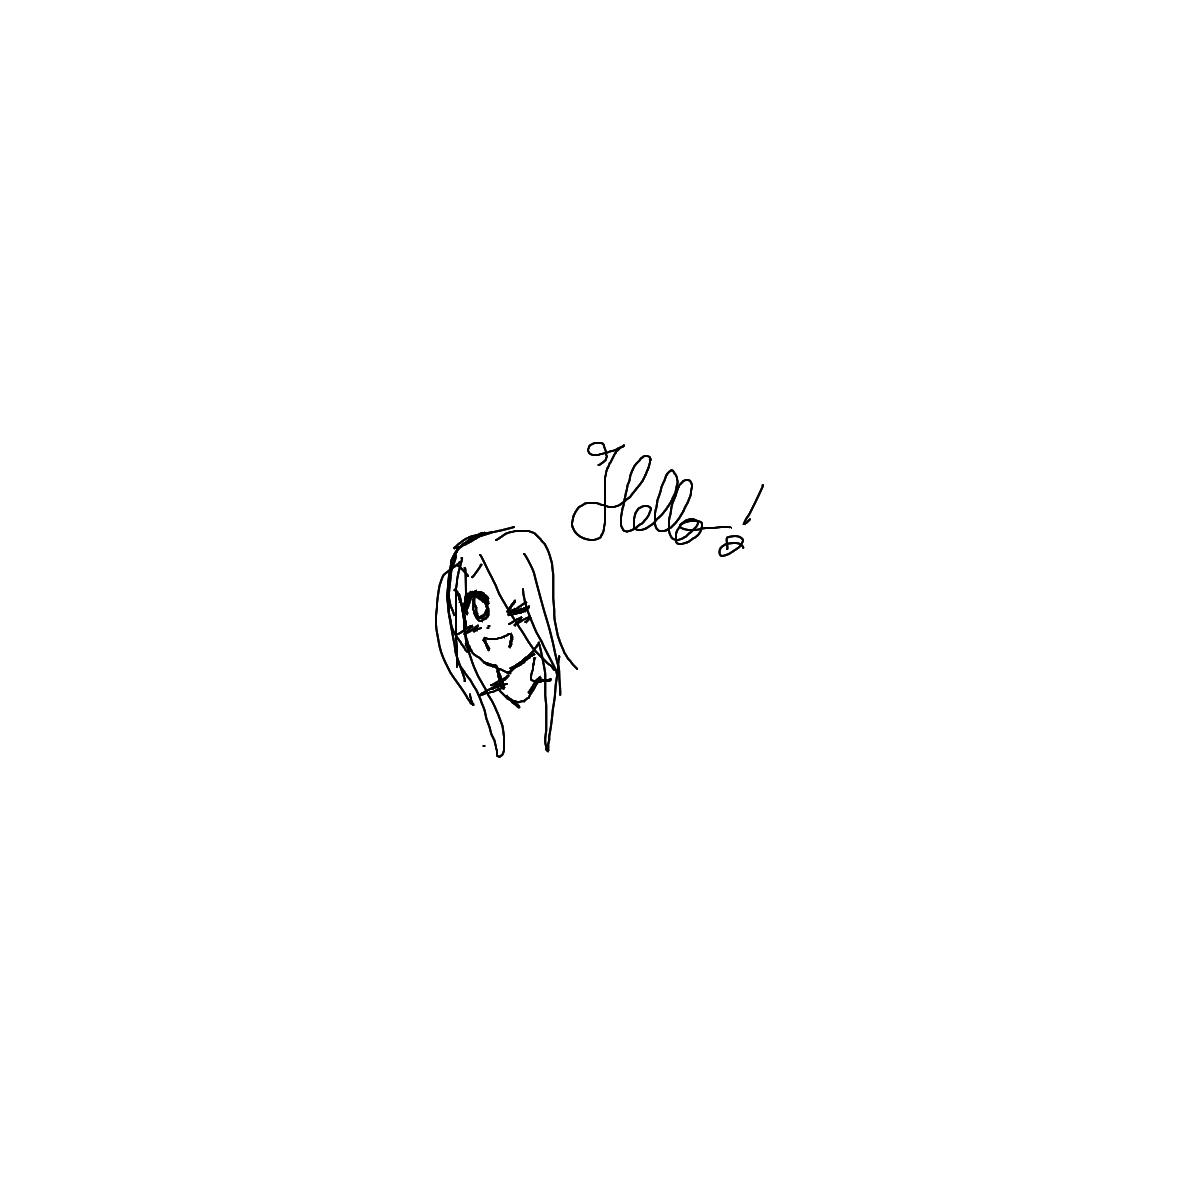 BAAAM drawing#18195 lat:43.7001533508300800lng: 1.8171108961105347